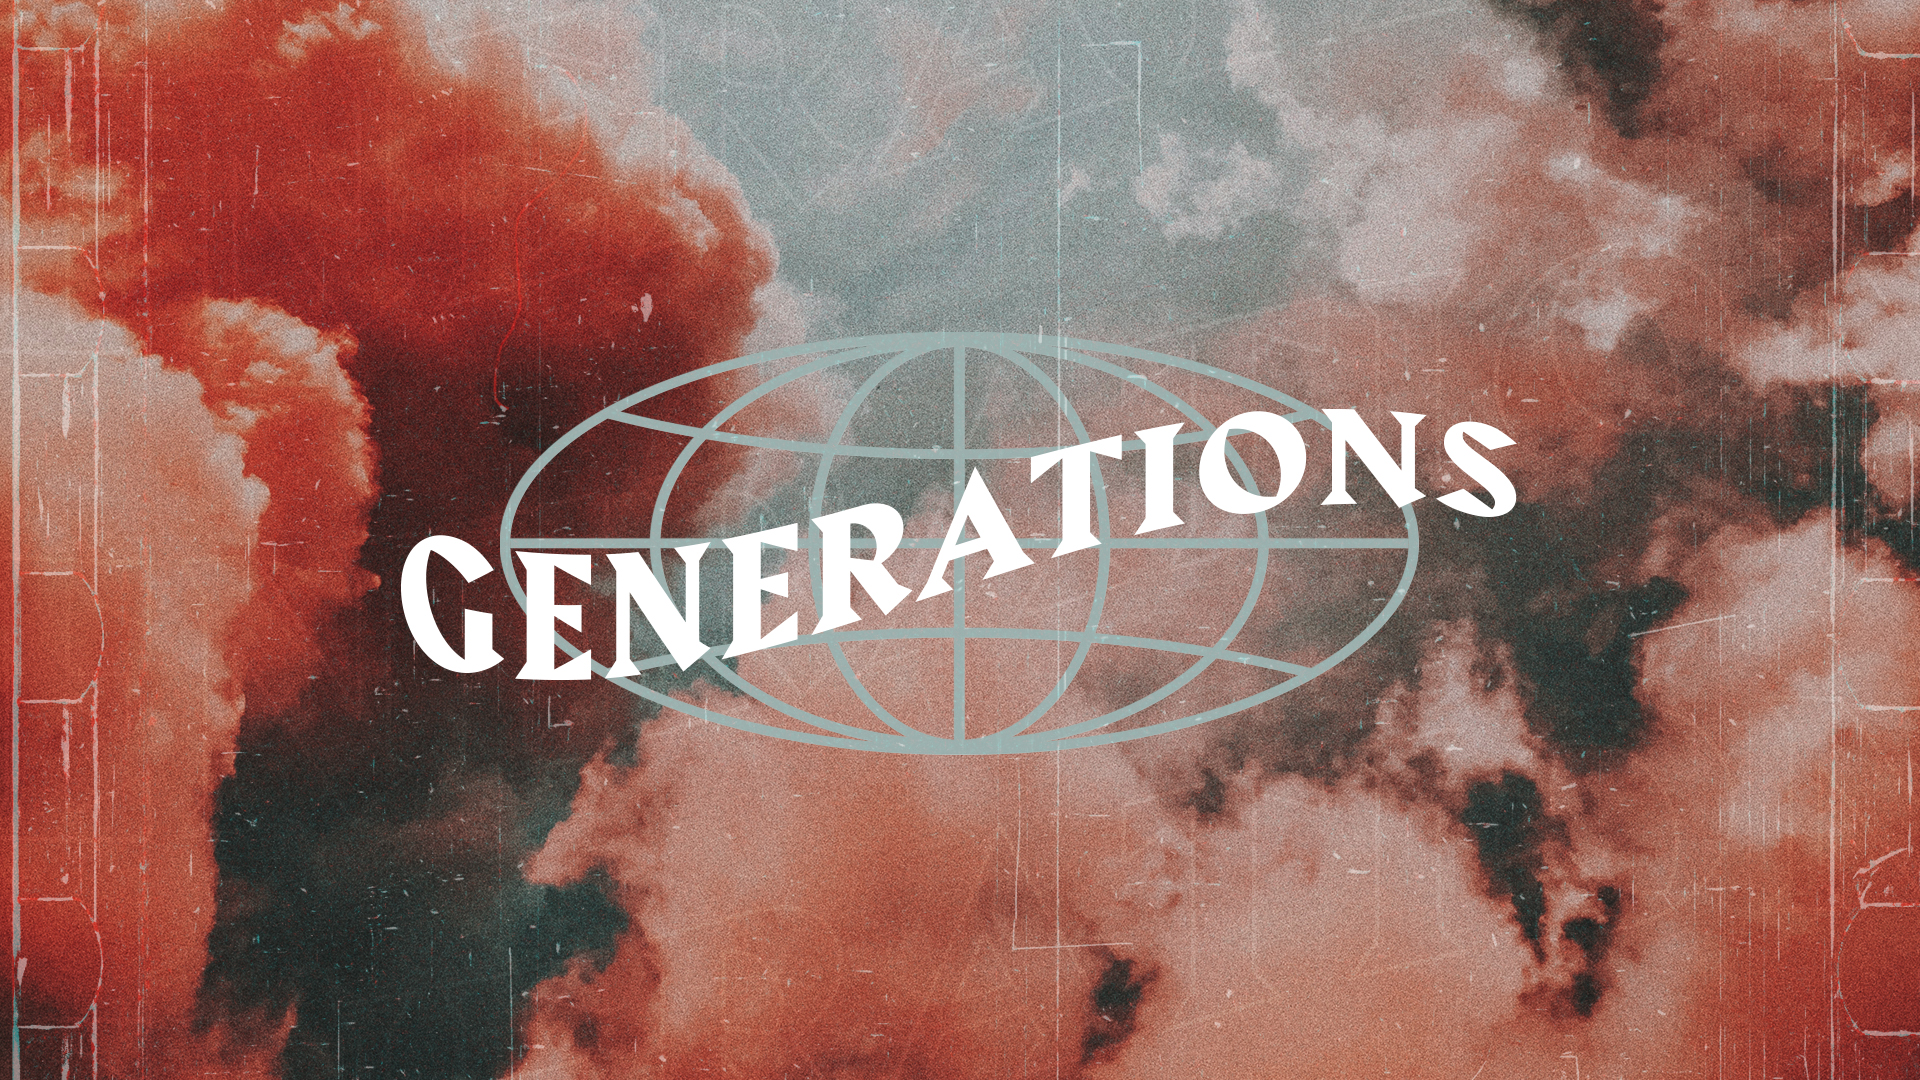 05_Generations.jpg